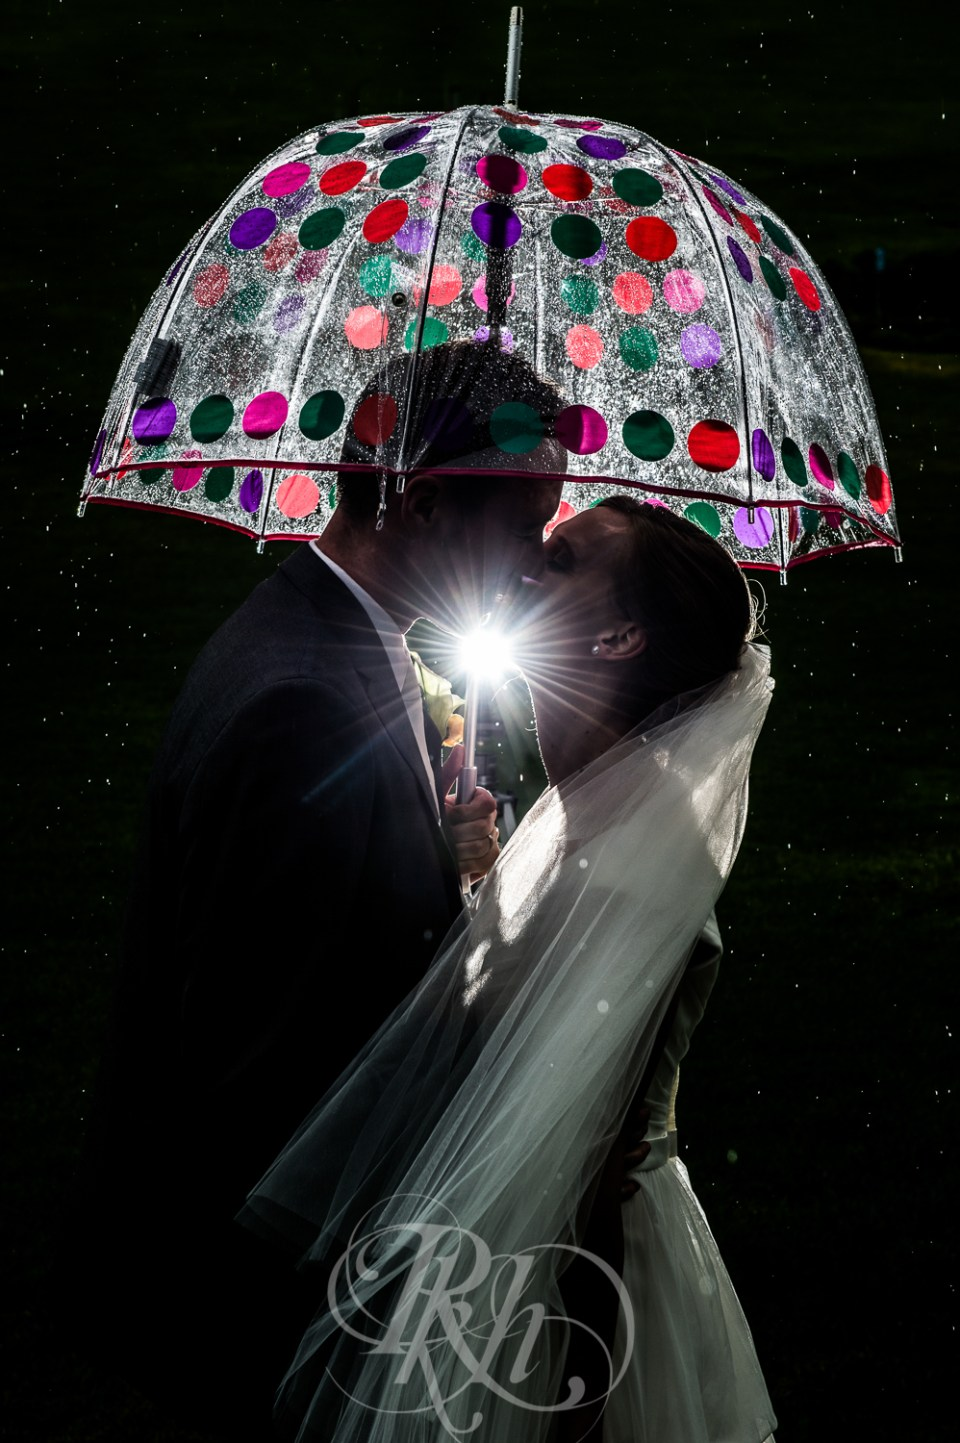 Rainy day wedding photo